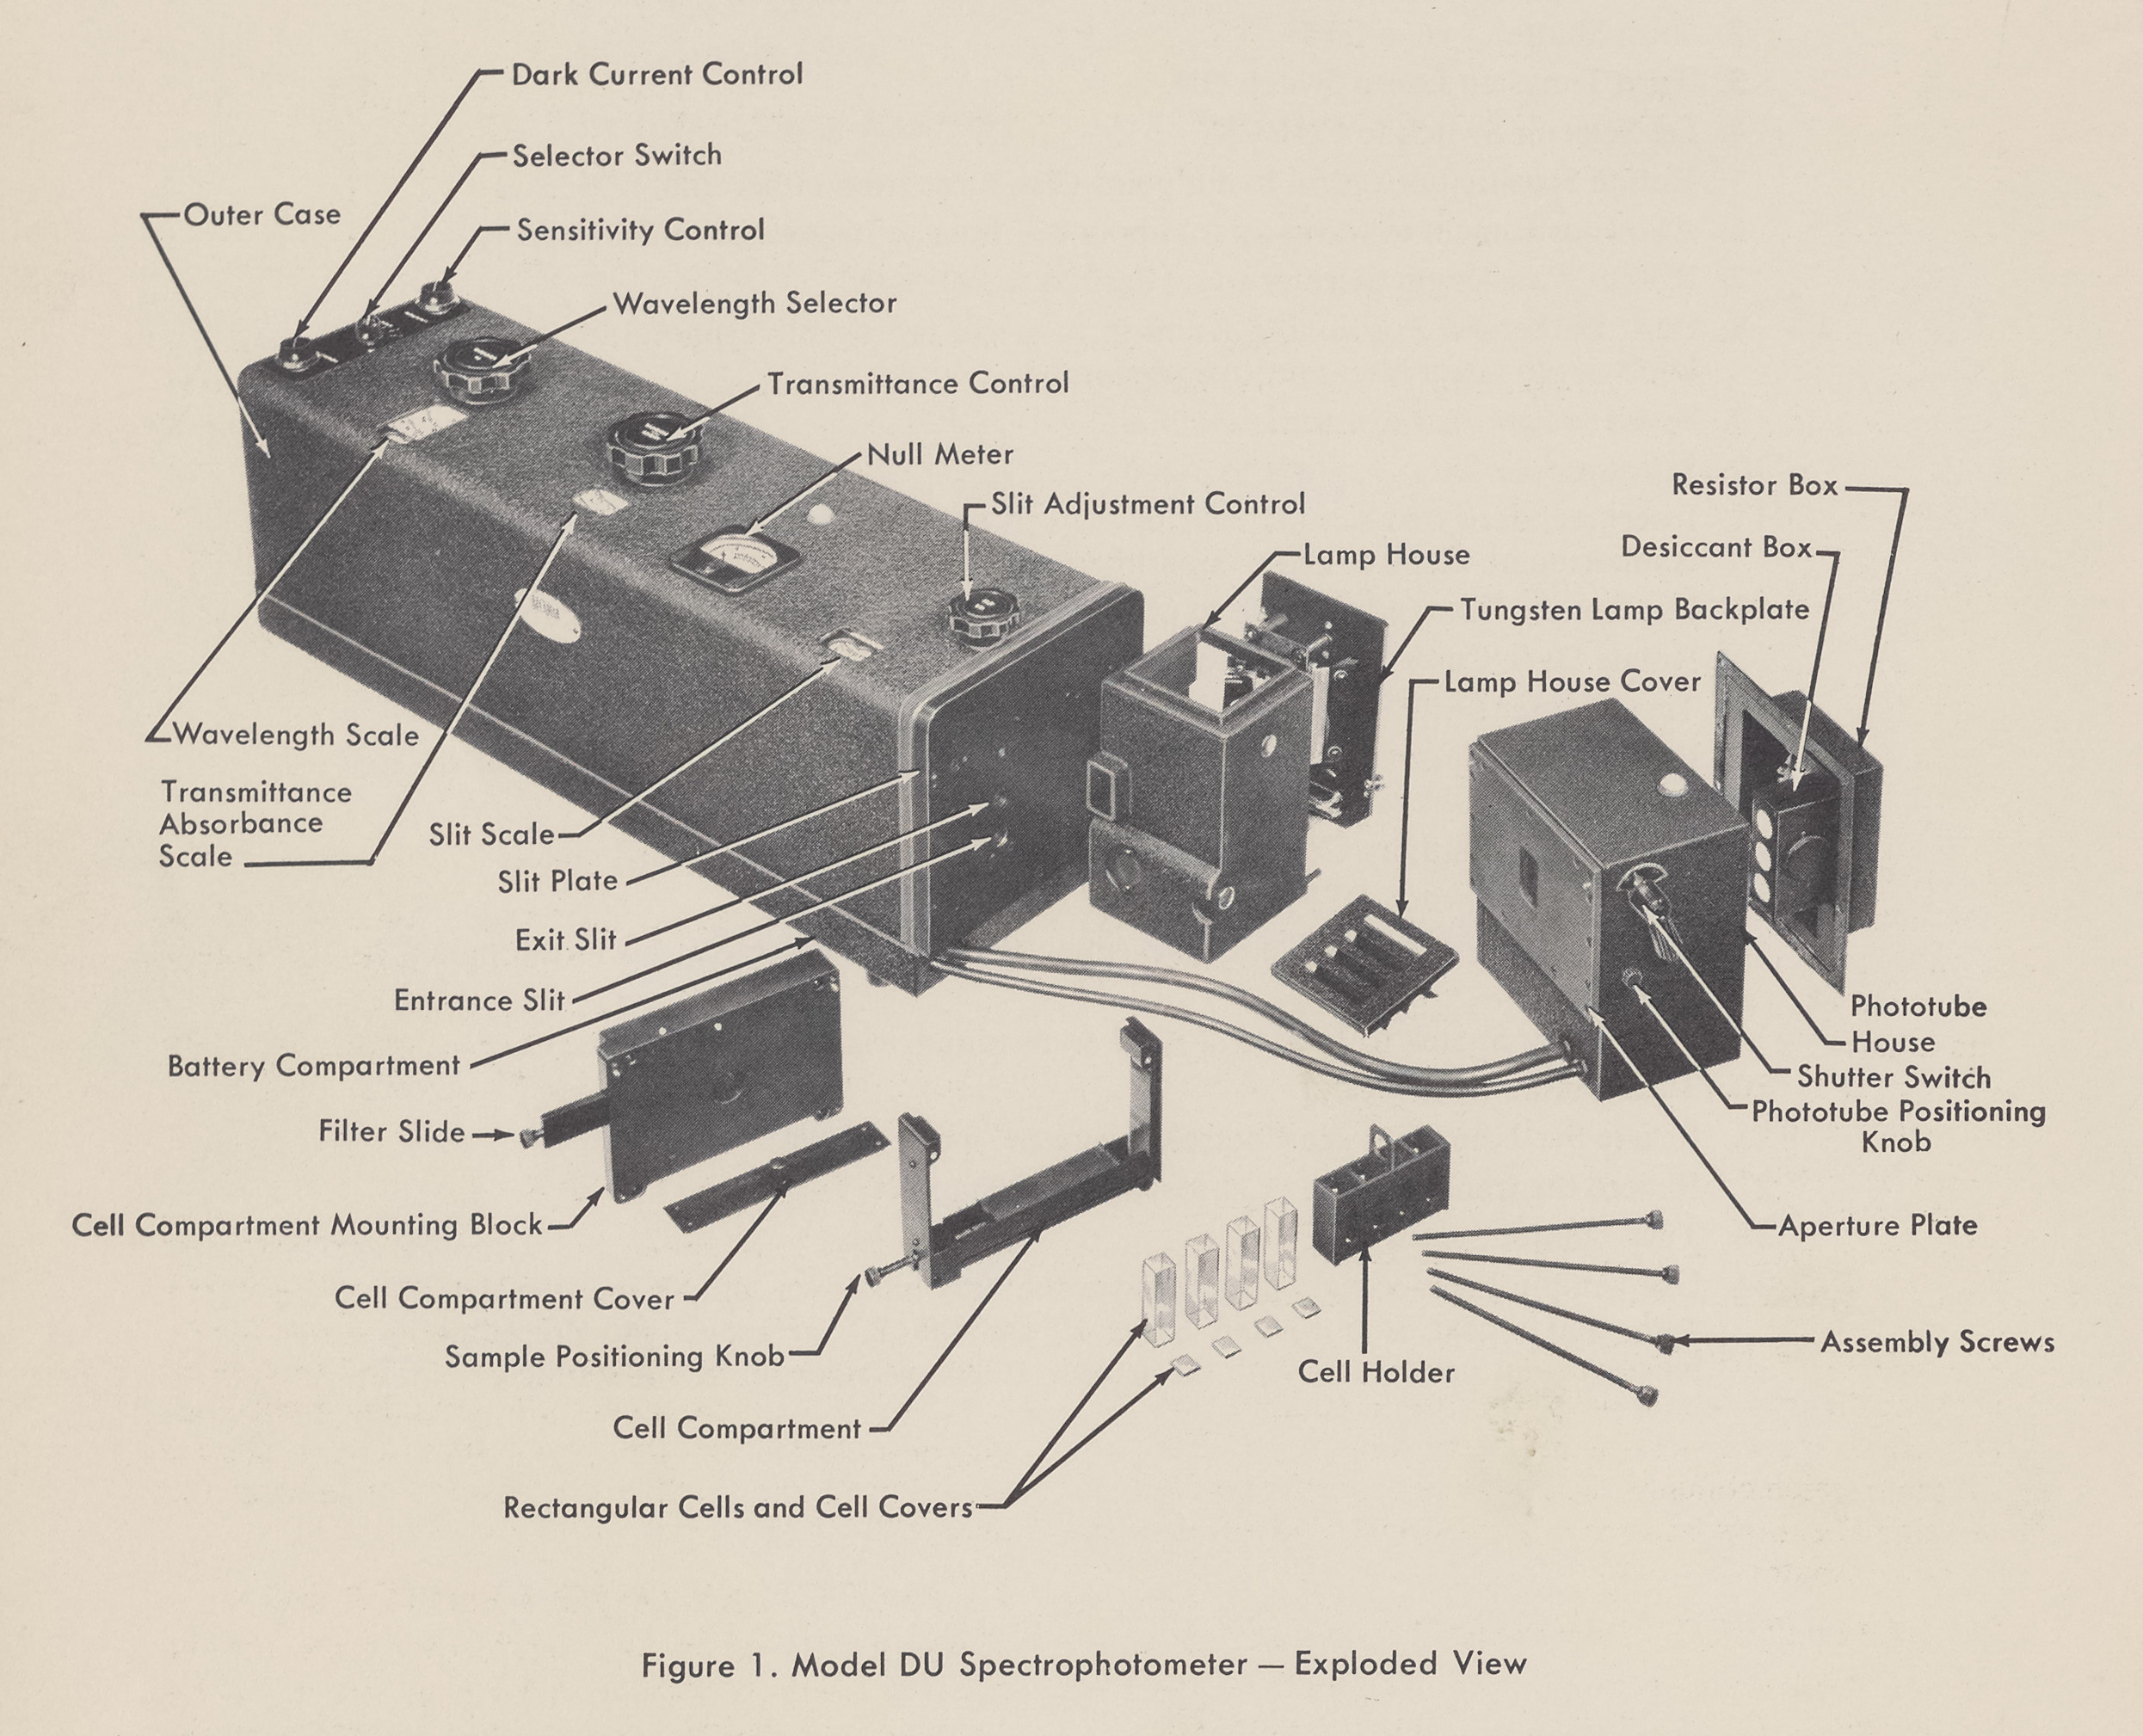 Du Spectrophotometer Wikipedia Dku 5 Circuit Diagram Designedit